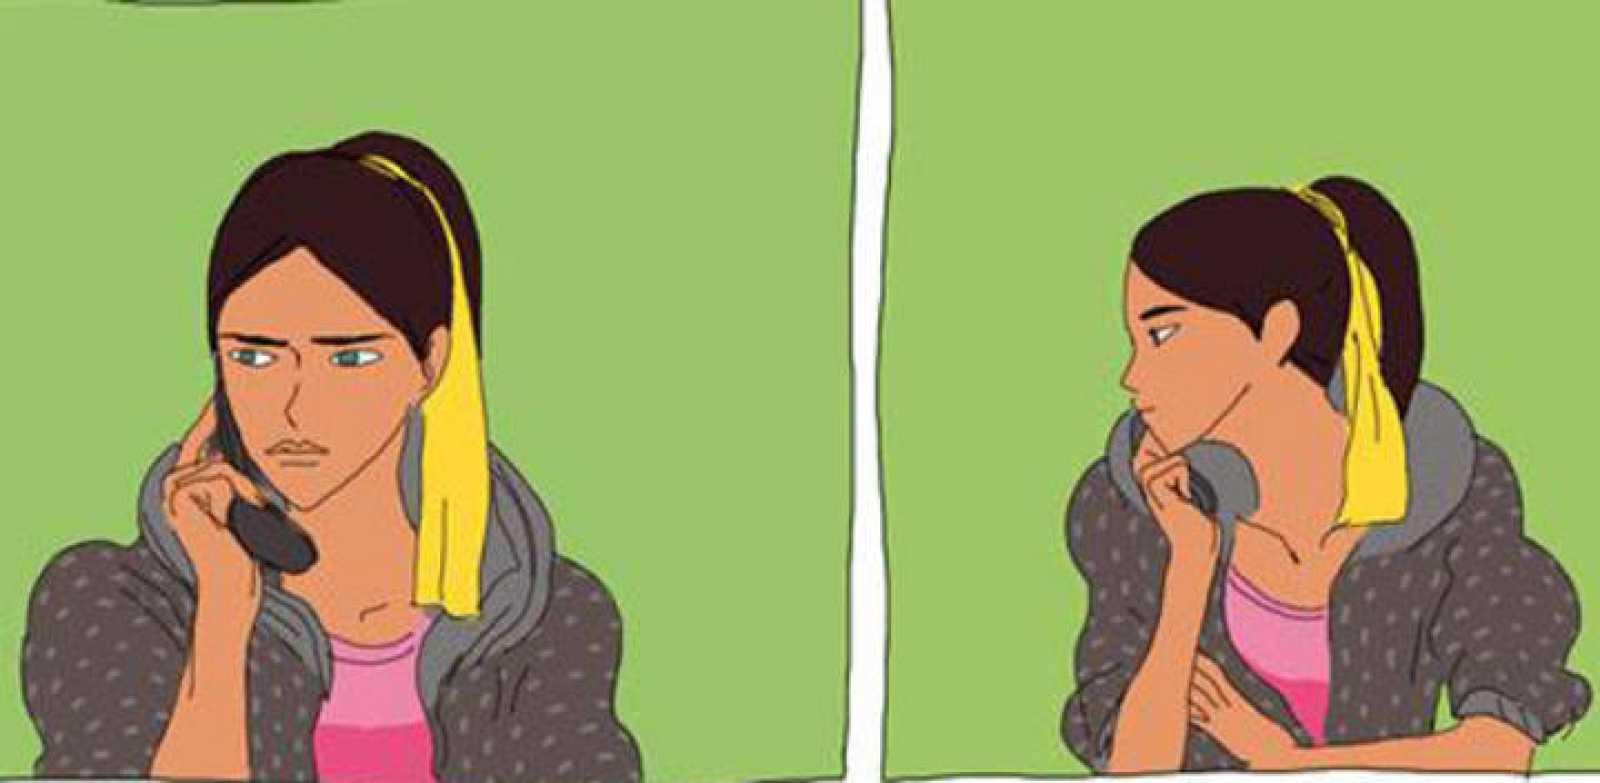 Viñetas de 'Amistad estrecha', de Bastien Vivès